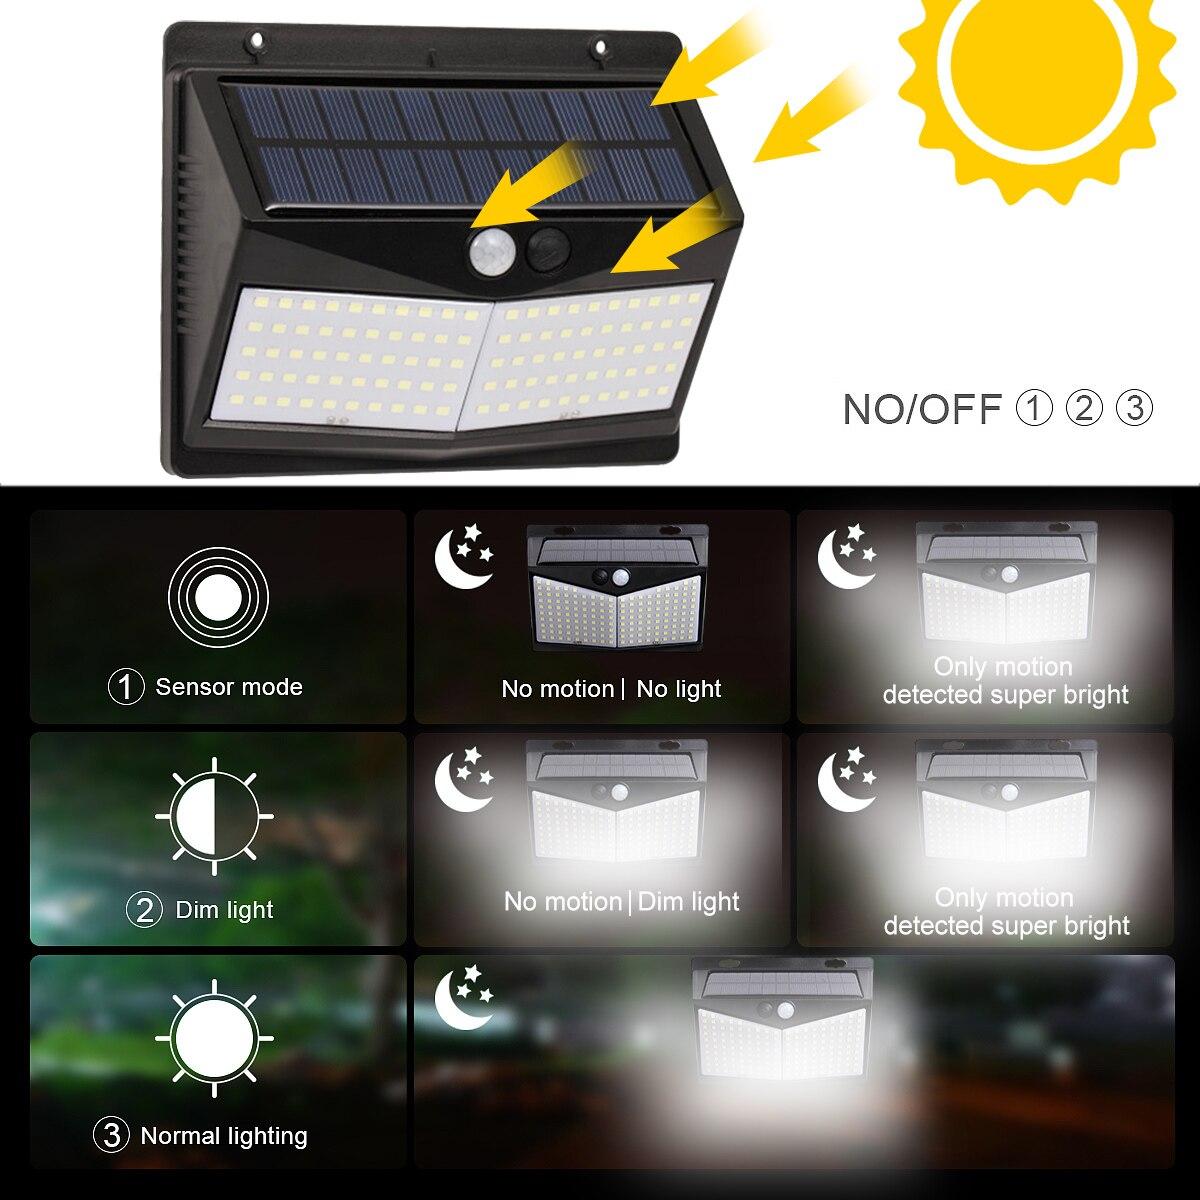 Luces de pared impermeables 3 modos móvil sin cables Sensor de luz luces solares al aire libre 108/208 LEDs 270 grados lámpara Solar angular